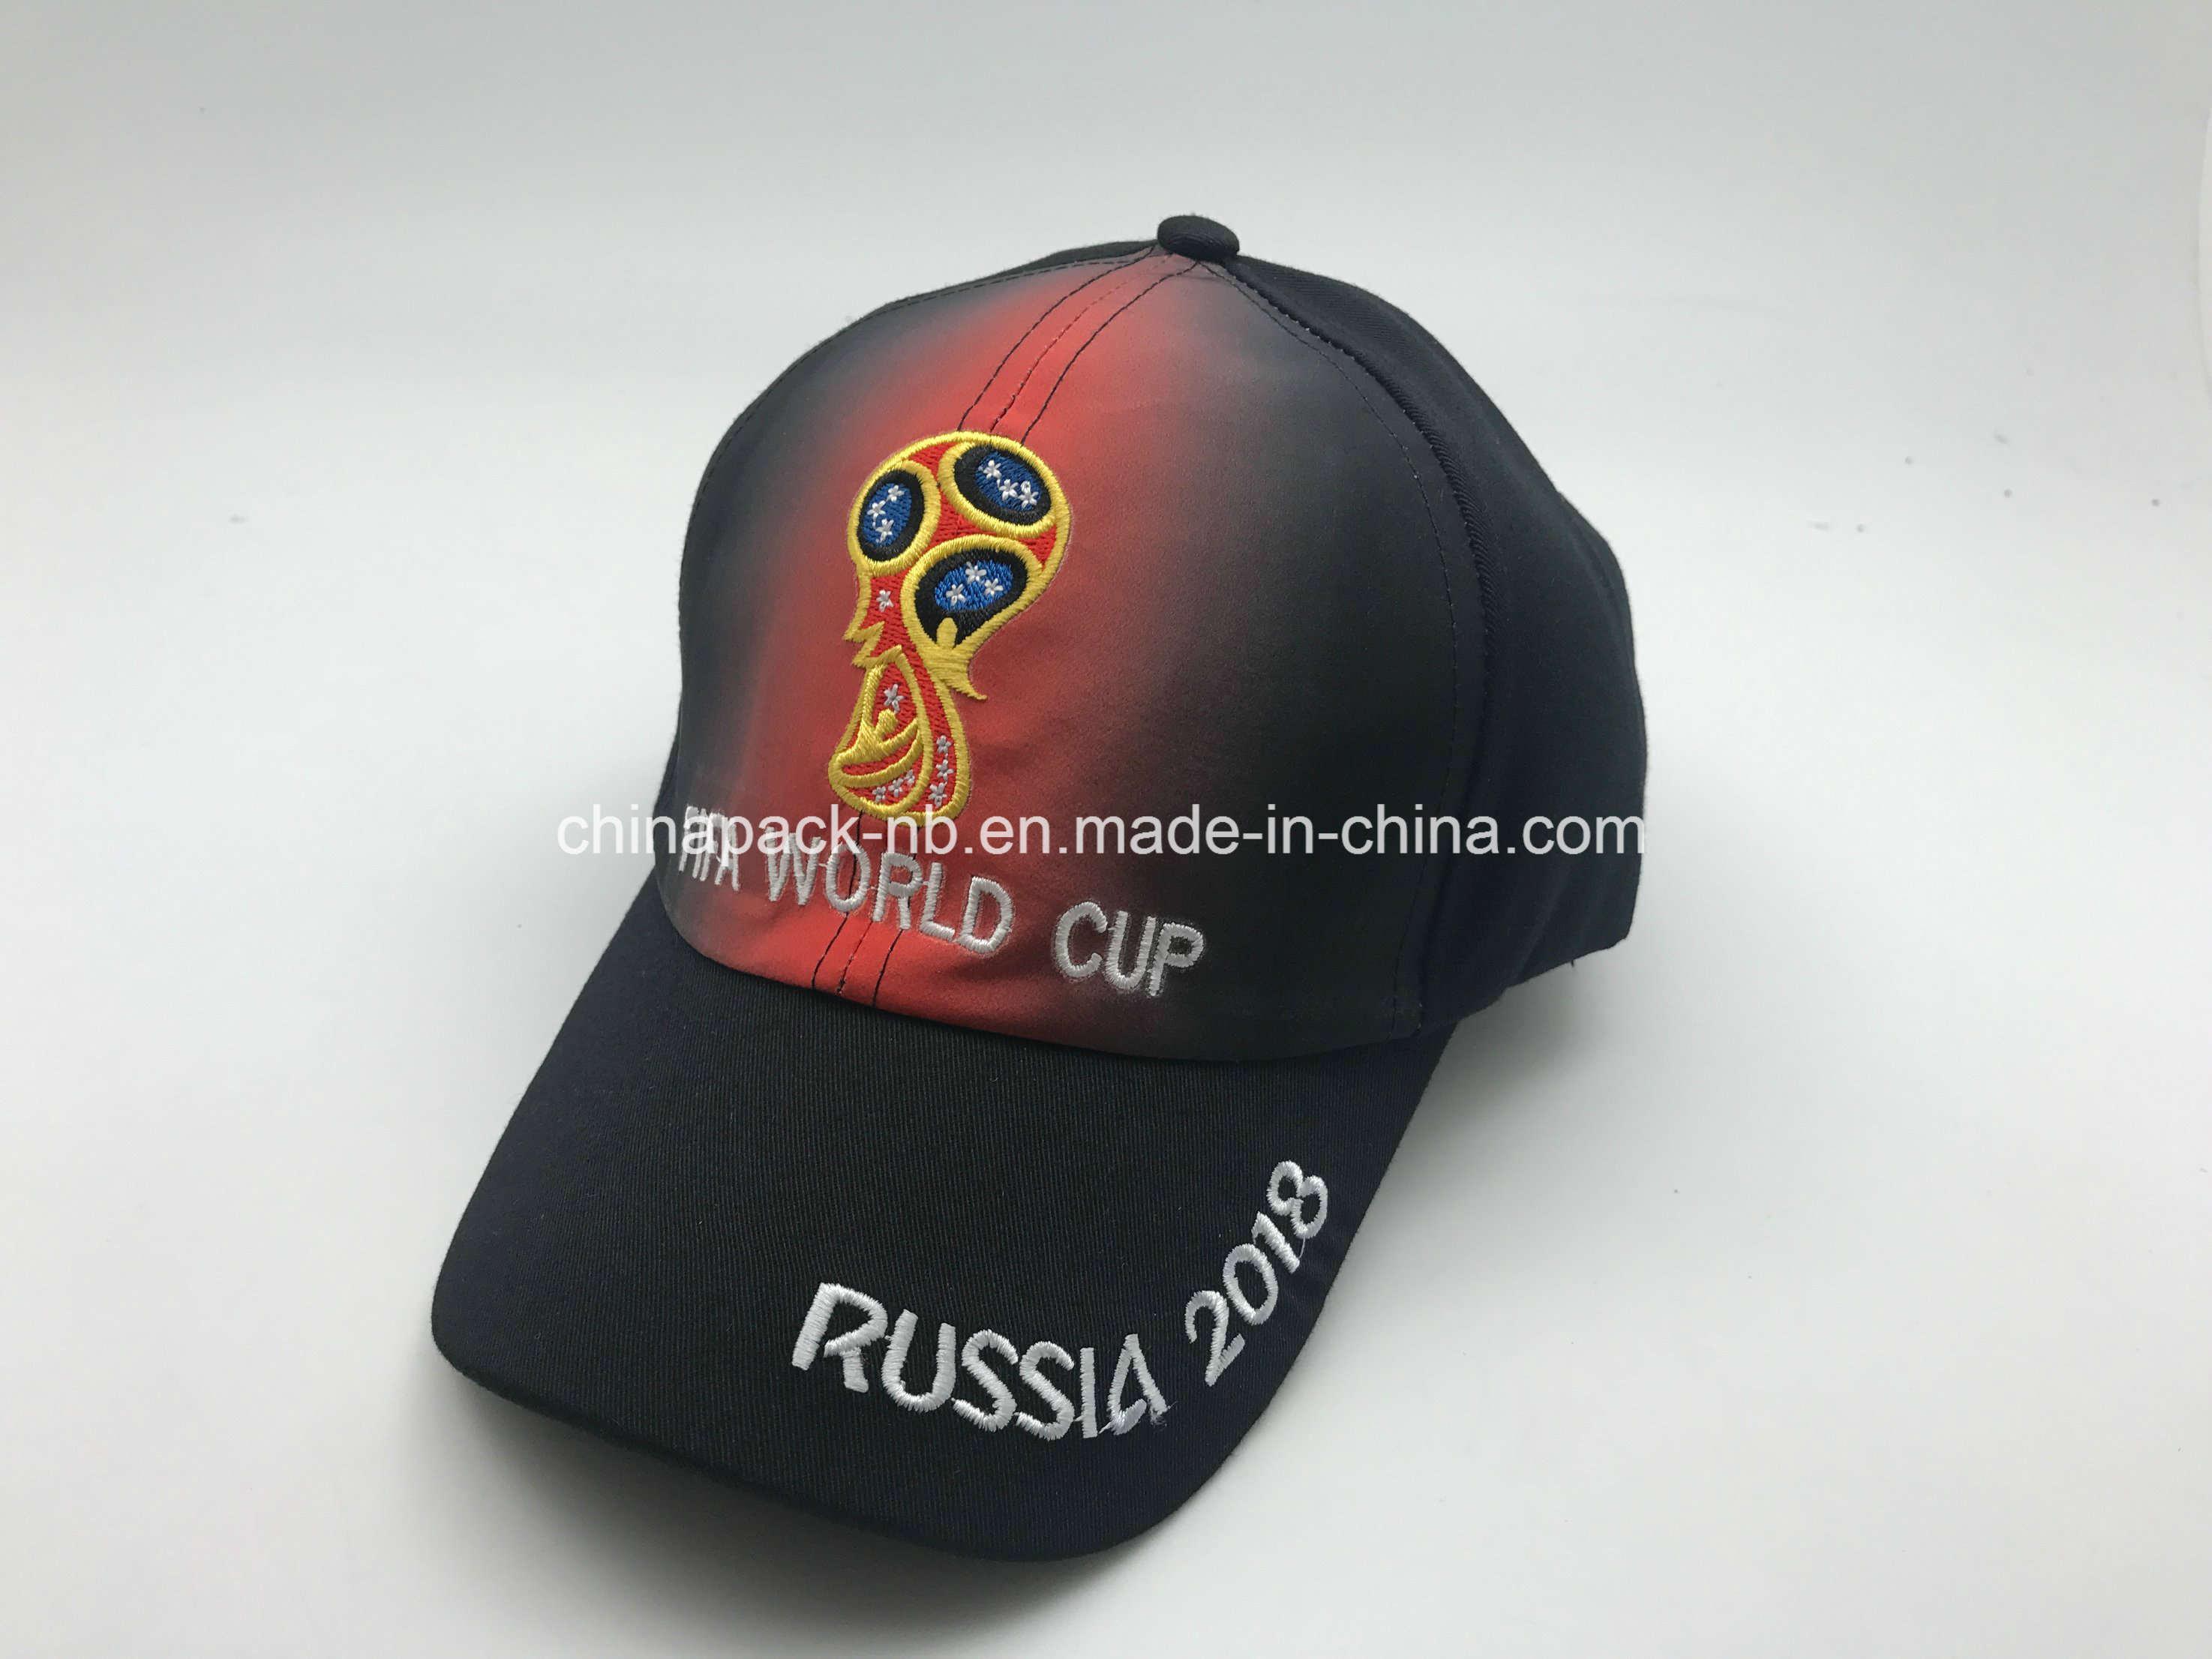 Fantastic Cap World Cup 2018 - Russia-2018-Fifa-World-Cup-Baseball-Cap  Gallery_711567 .jpg